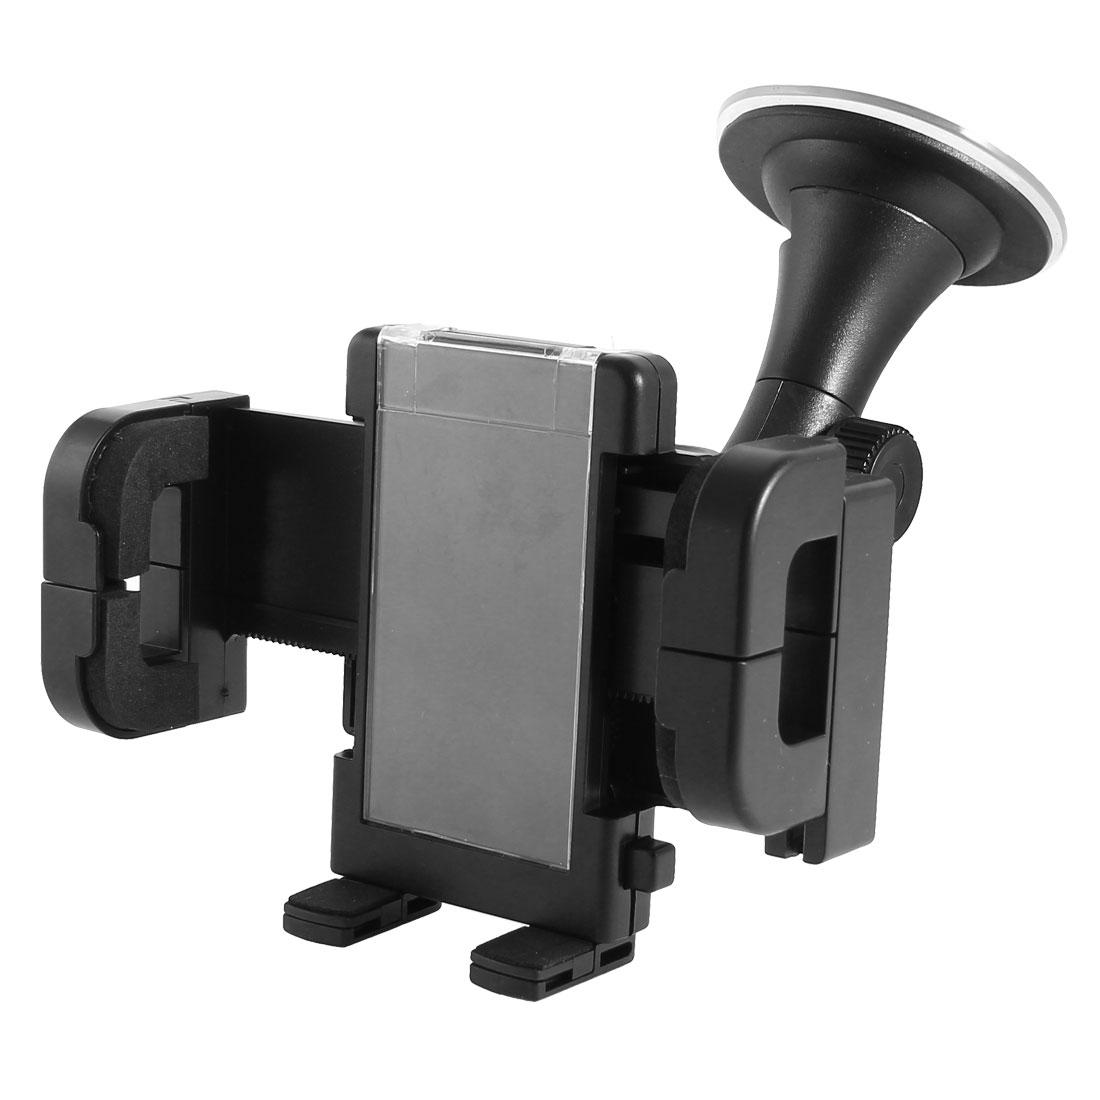 Black Suction Base Windshield Car Mount Cradle Holder for Cell Phone GPS